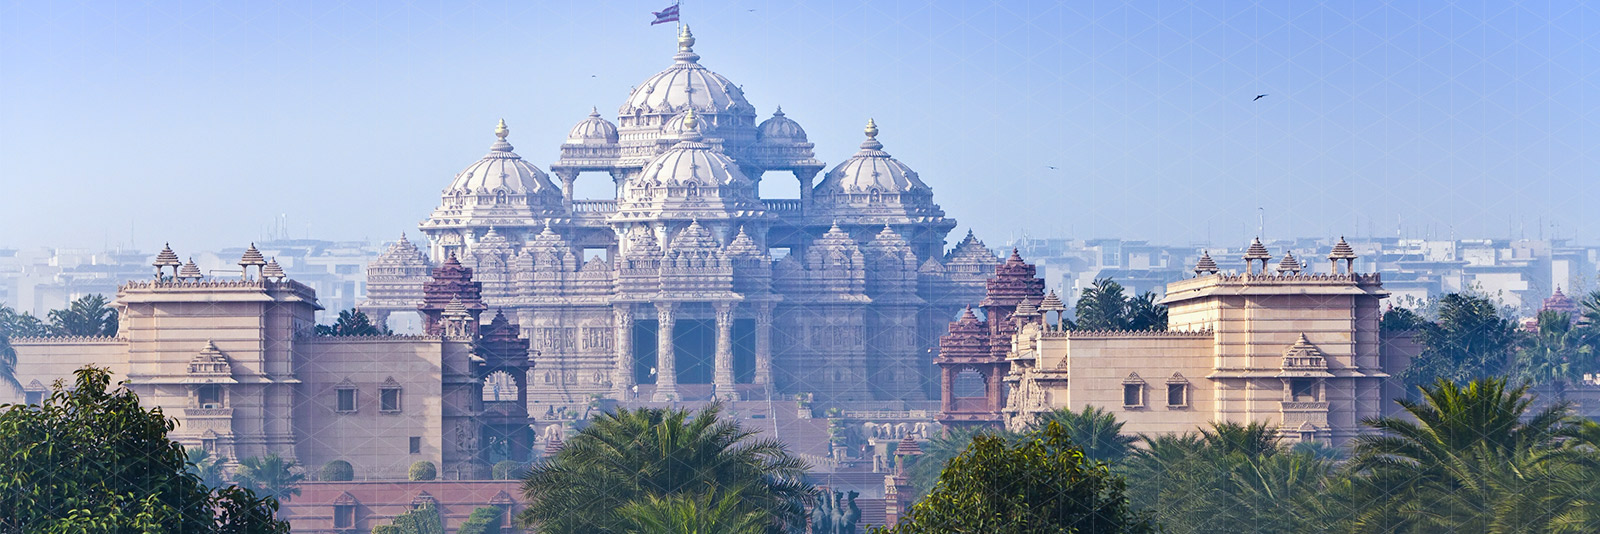 TRADE SHOW: PROPAK INDIA 2021